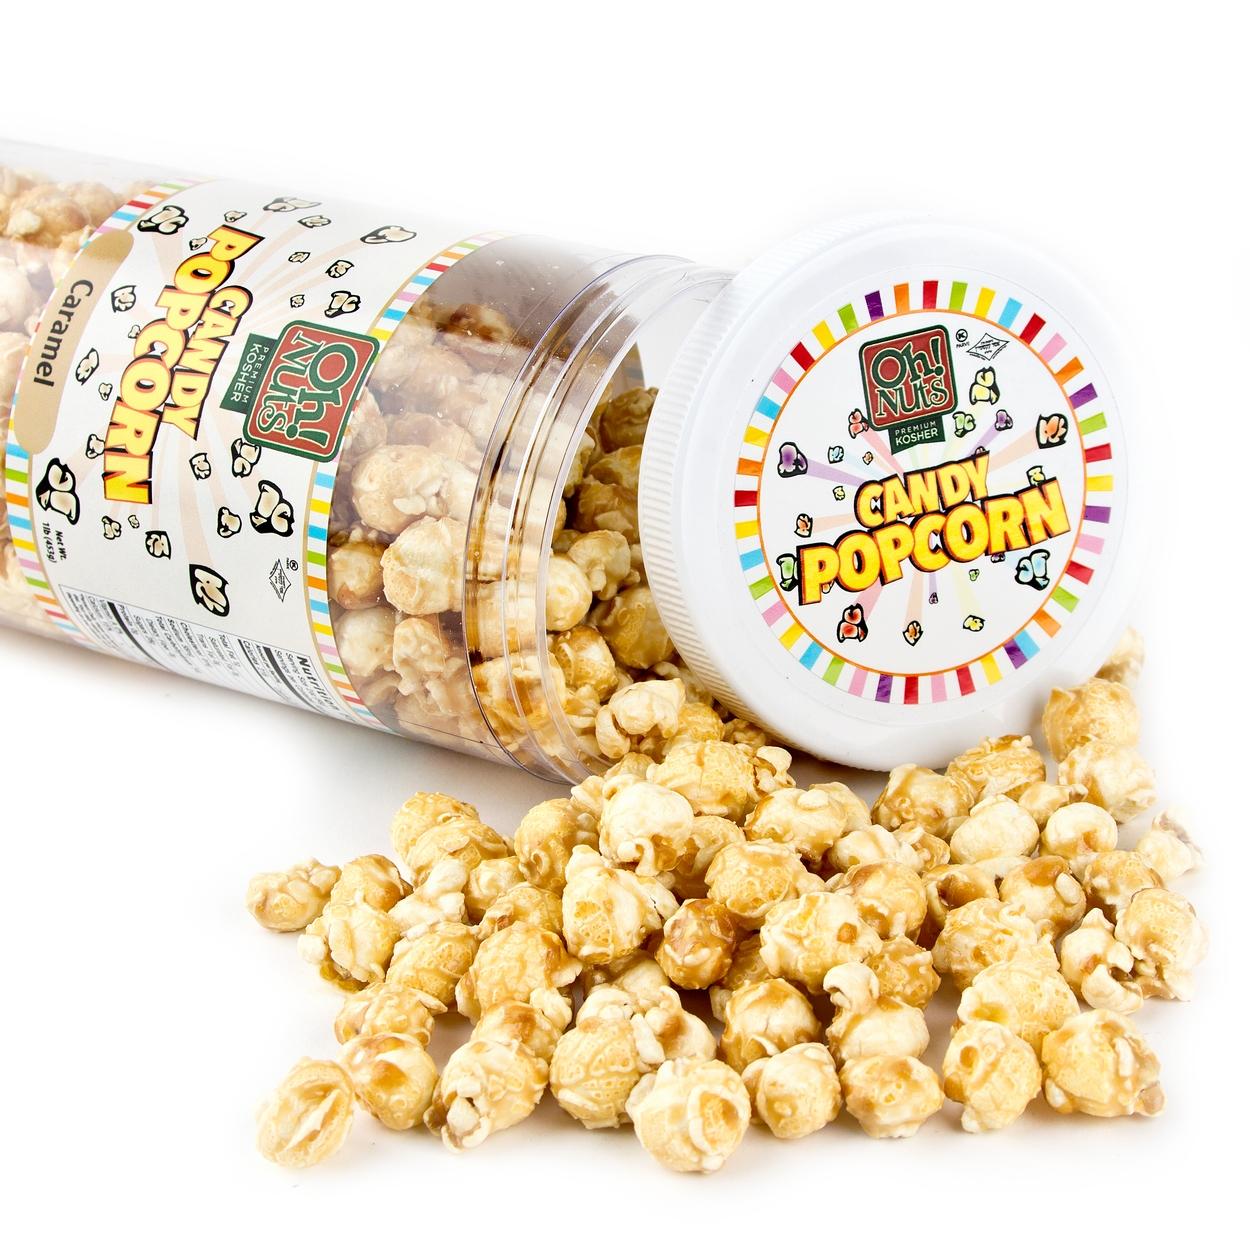 Bulk Popcorn – Buy In Bulk By The Pound – Wholesale • Oh! Nuts®